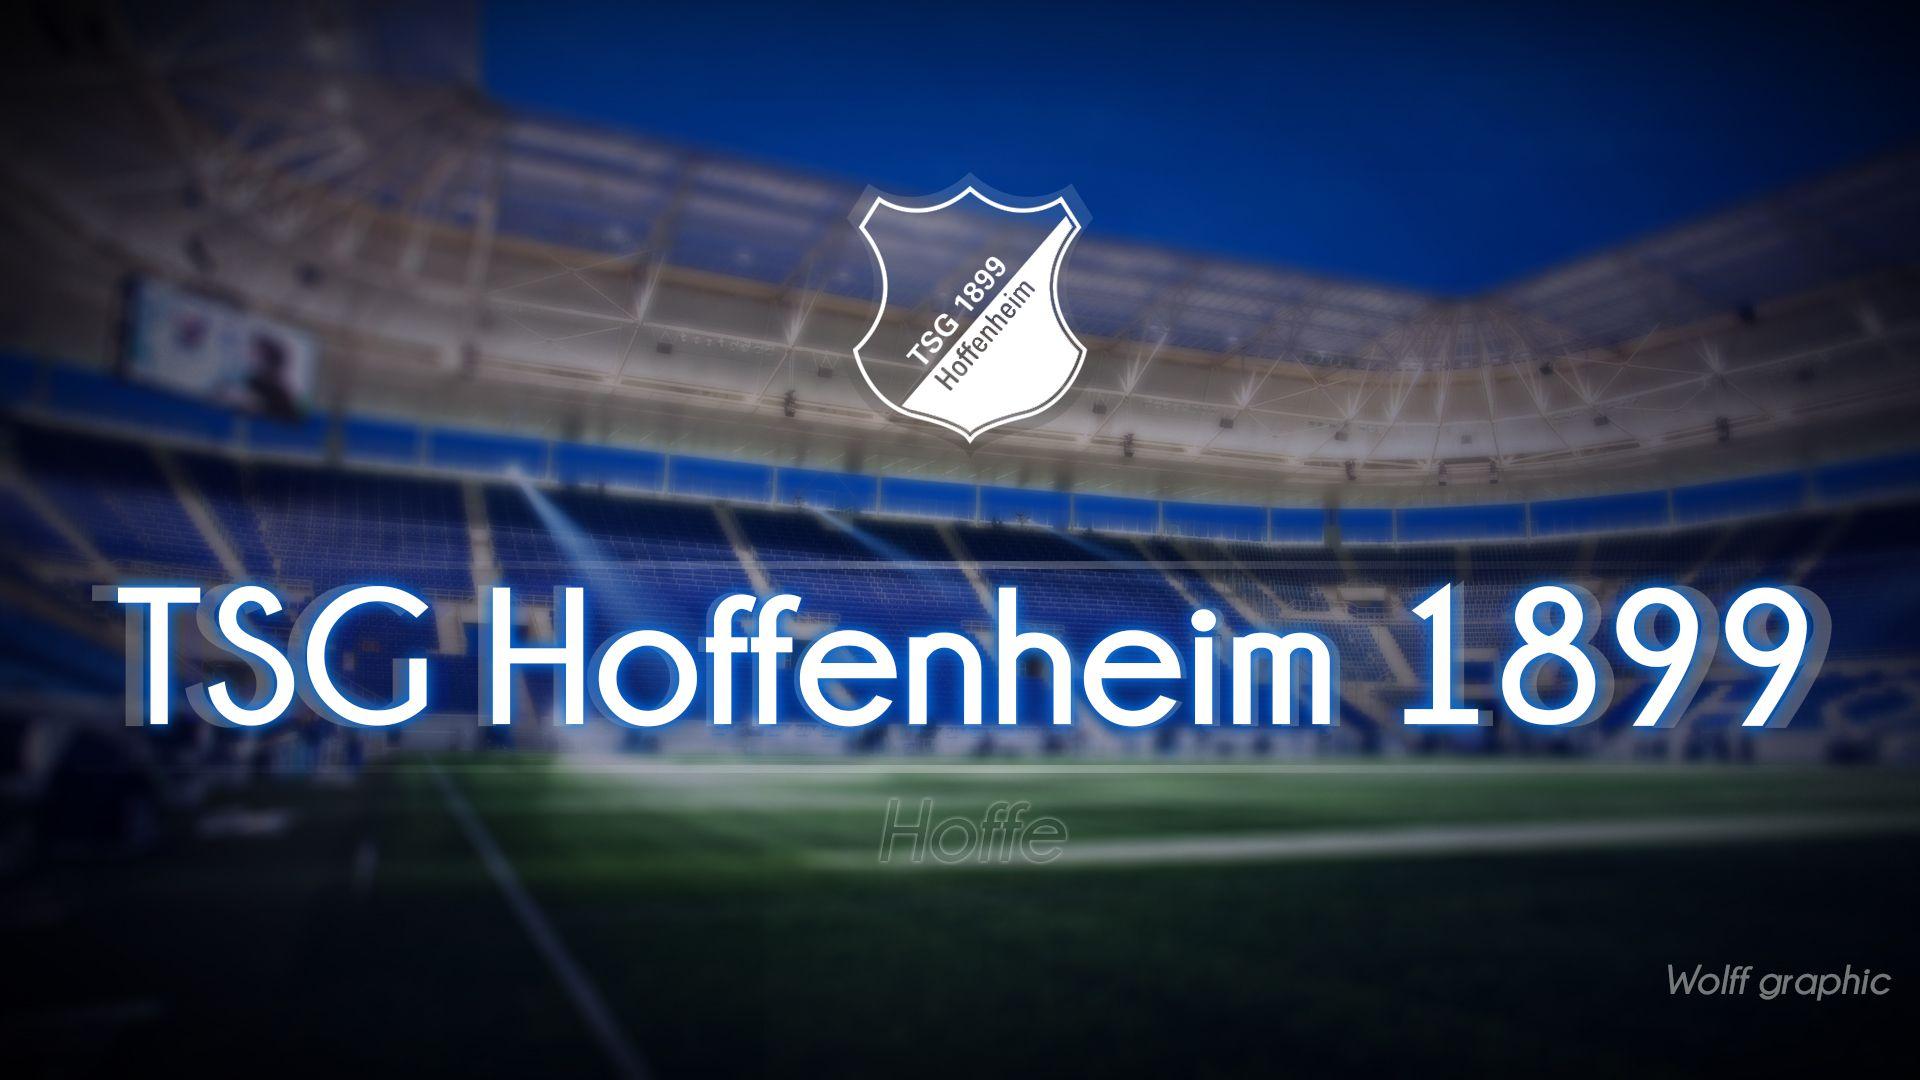 www tsg hoffenheim